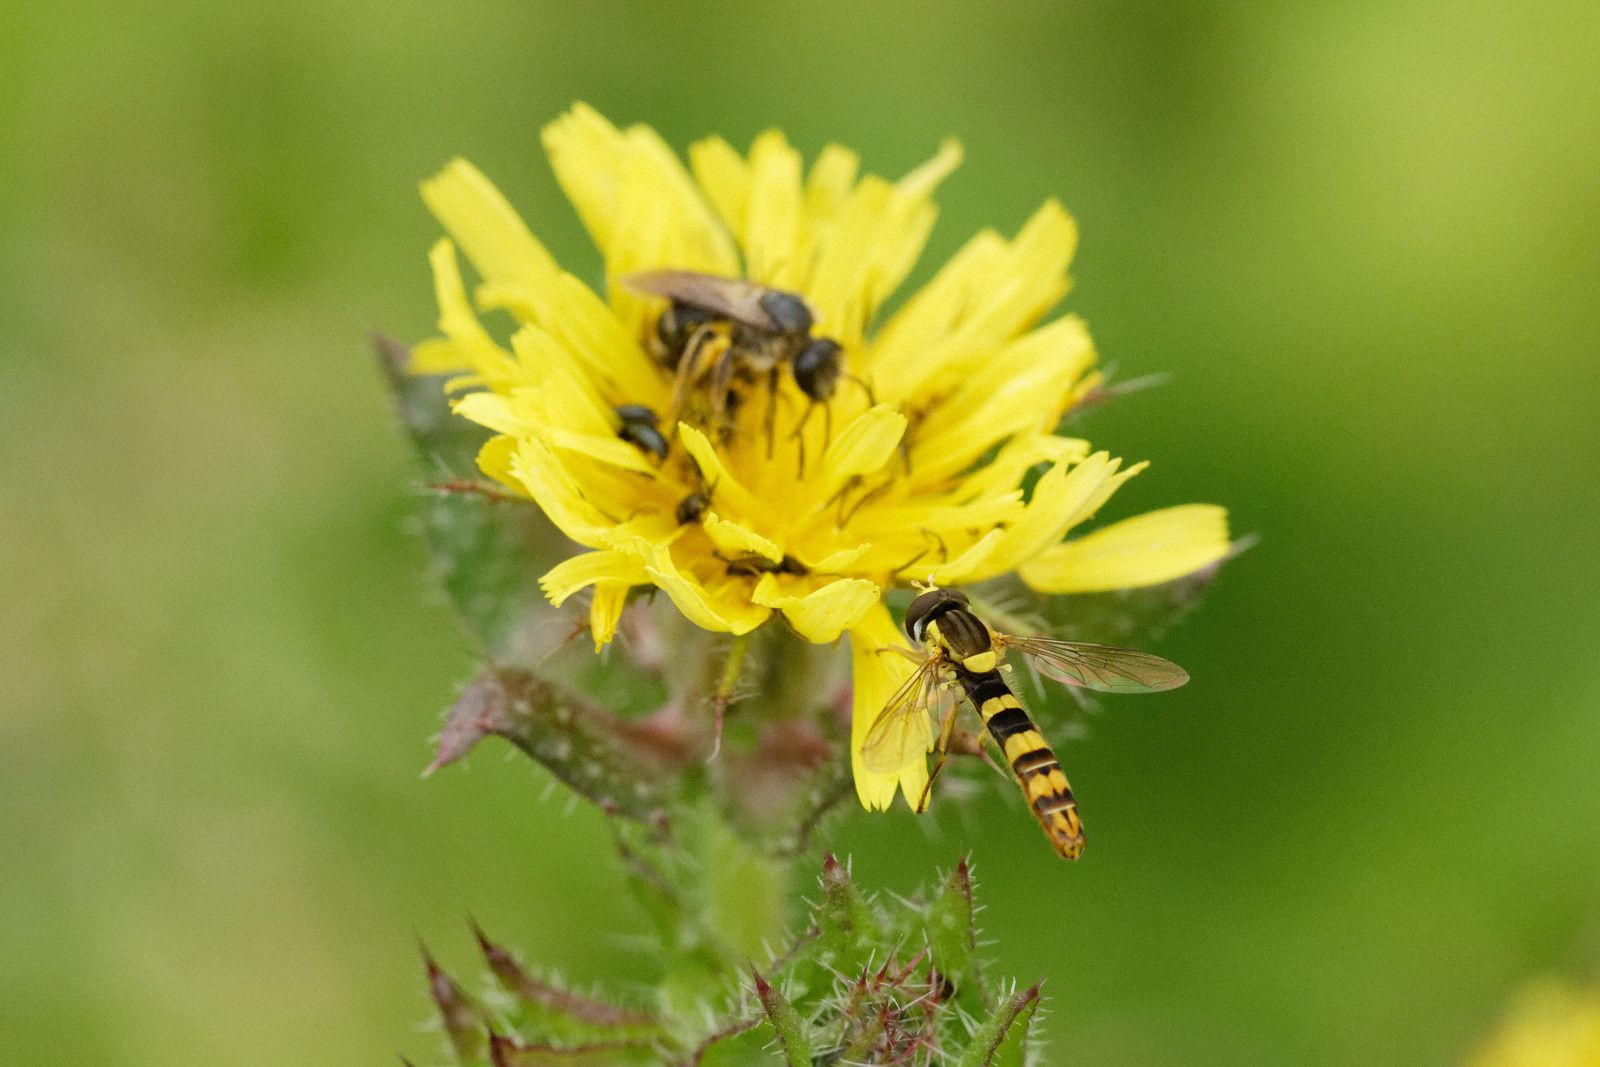 Syrphe porte-plume, Abeille sauvage et micros-Coléoptères